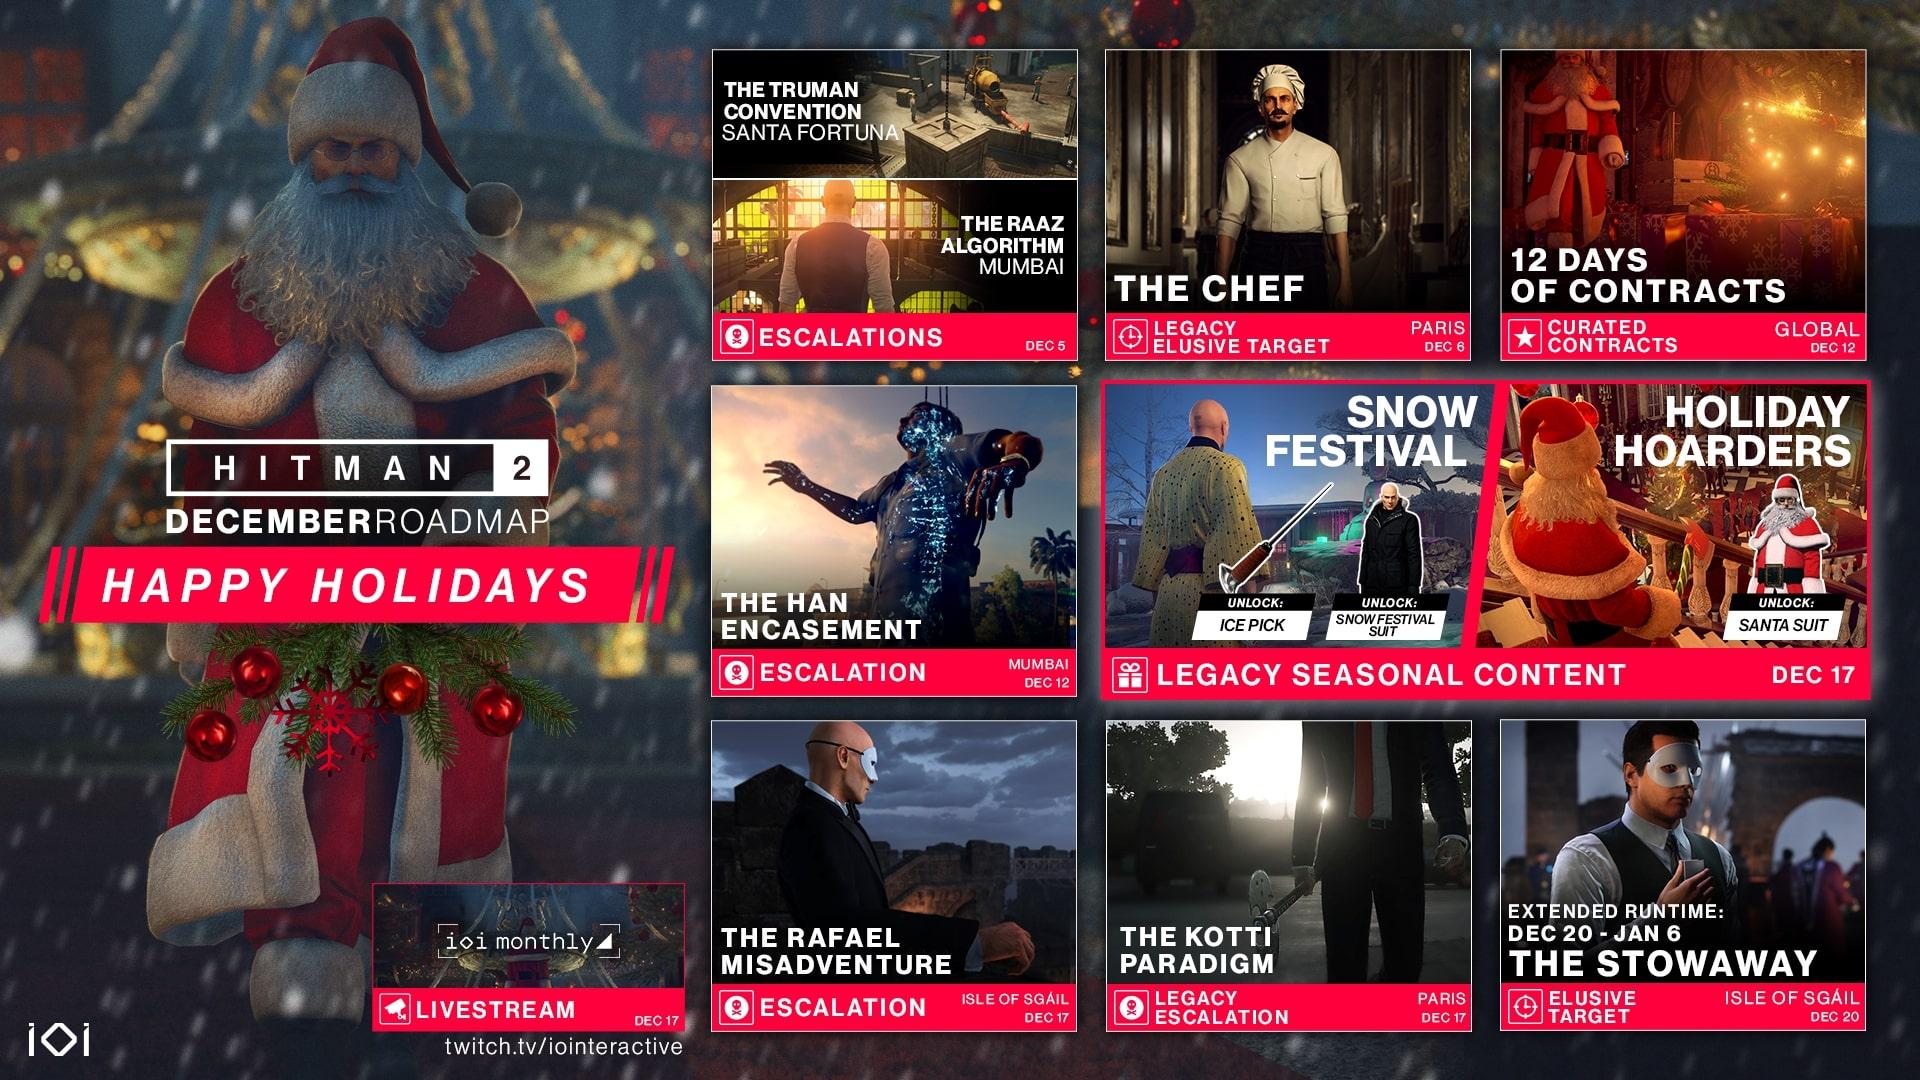 Co se v prosinci chystá do HITMAN 2? This is the final December Roadmap